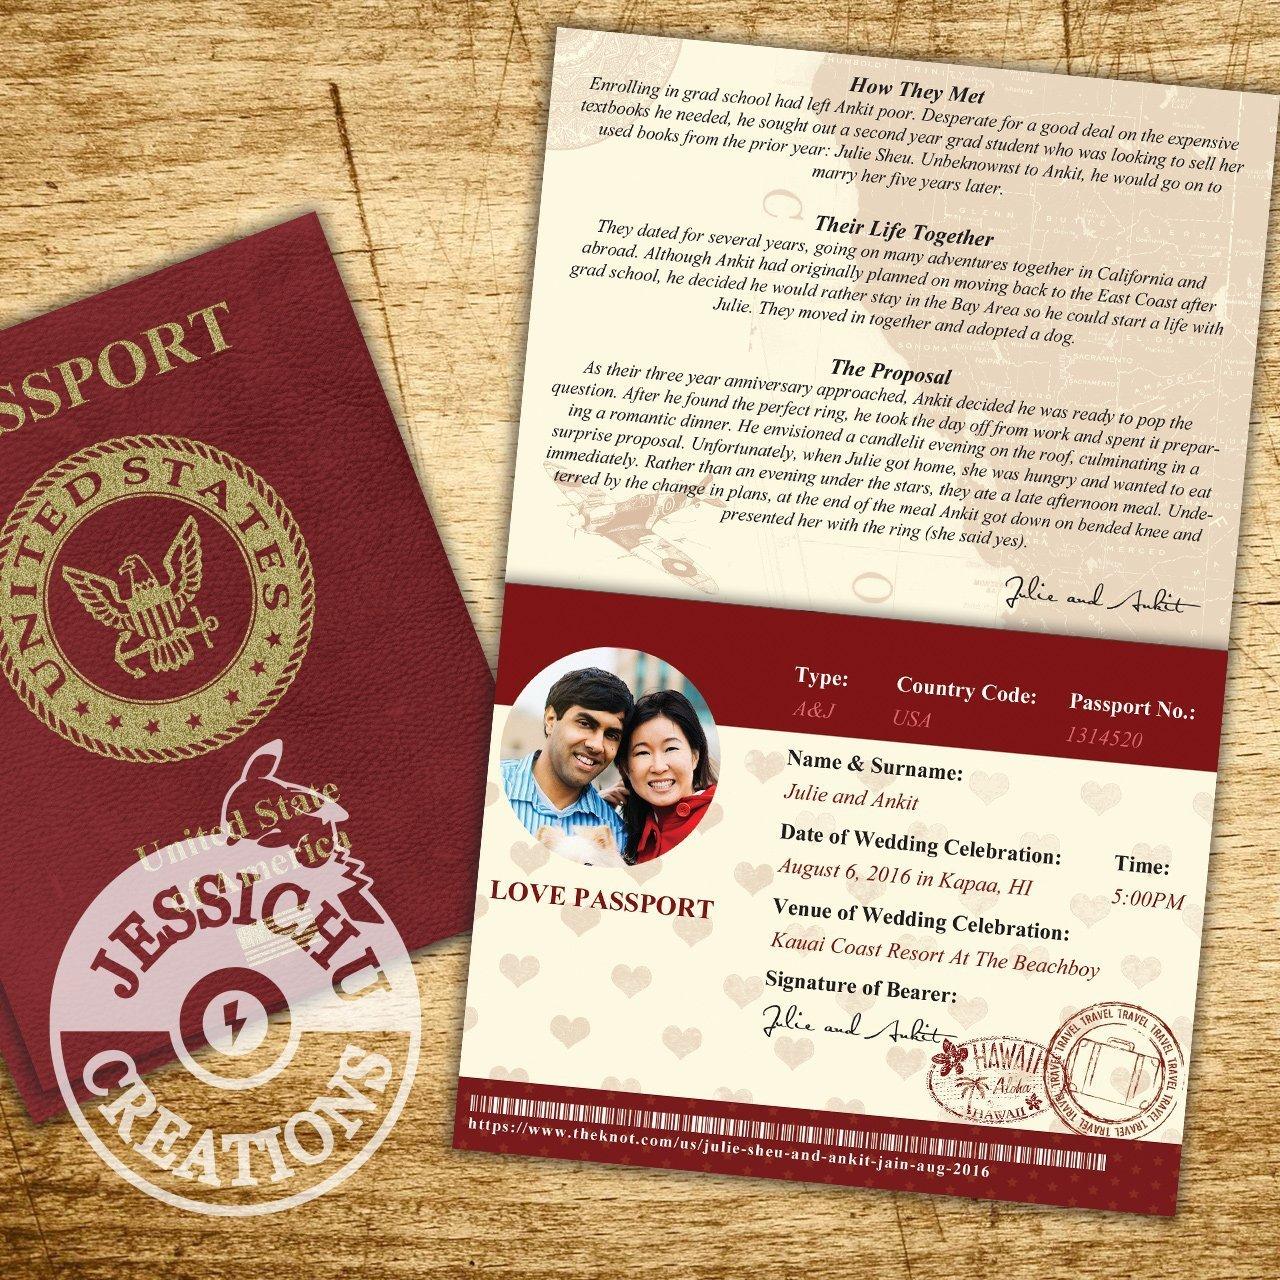 Amazon.com: Passport & Ticket Wedding Invitation, Programs, Save the ...